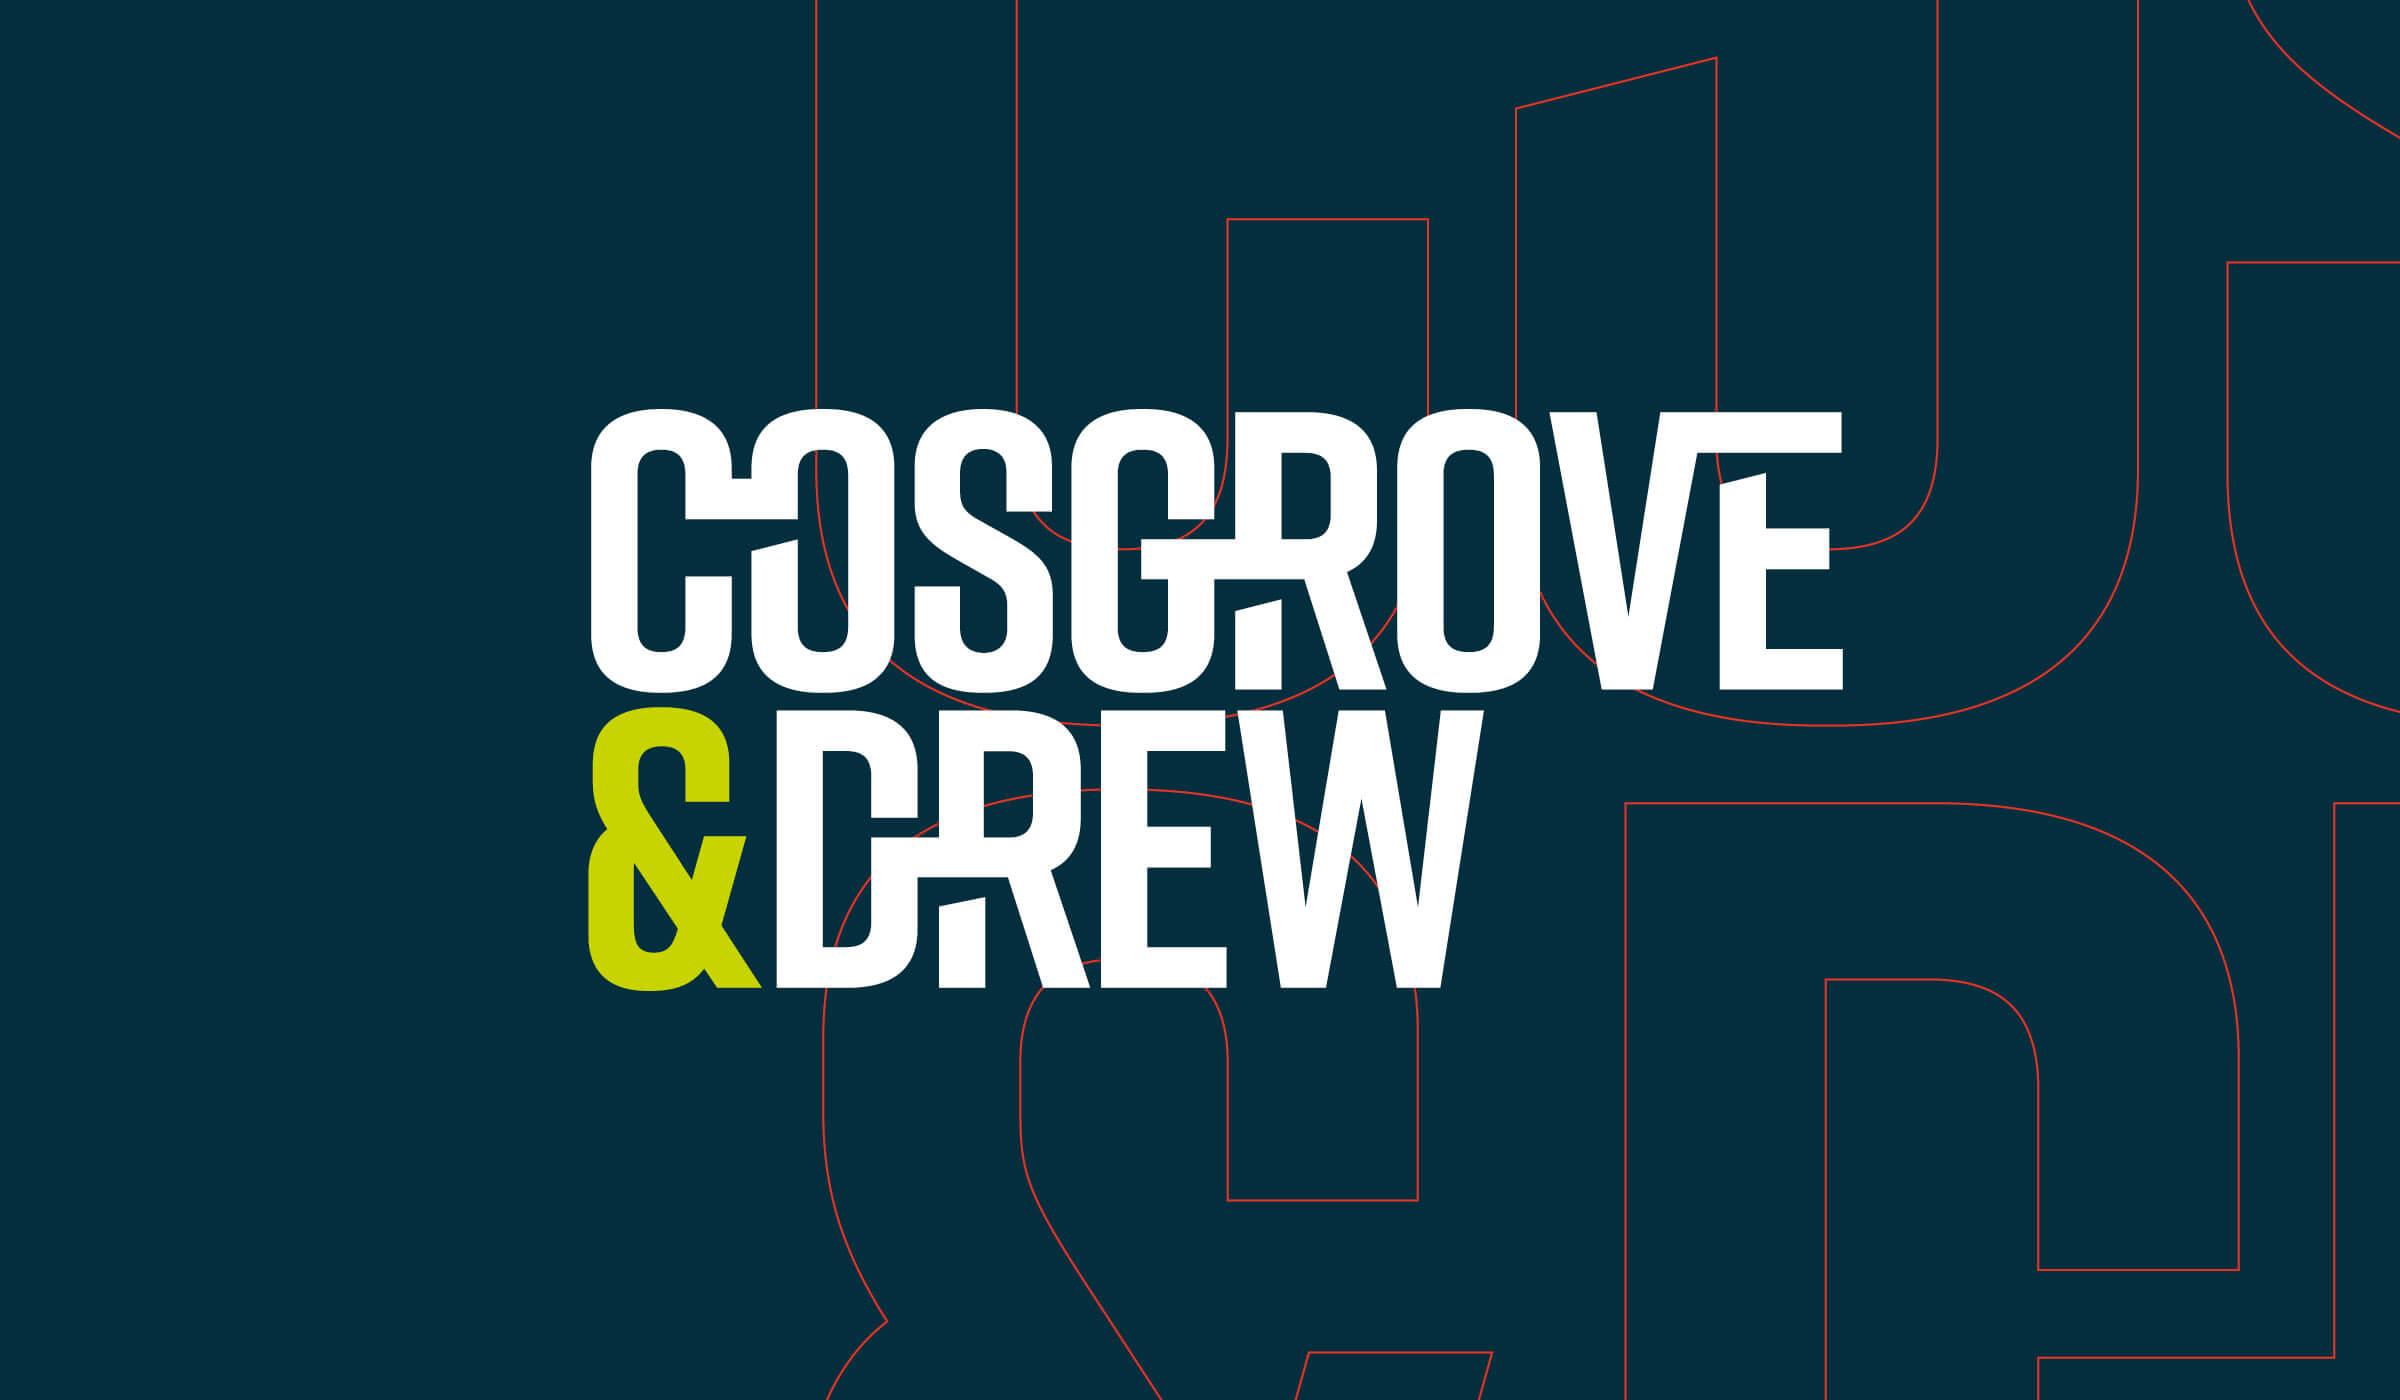 Cosgrove & Drew logo design